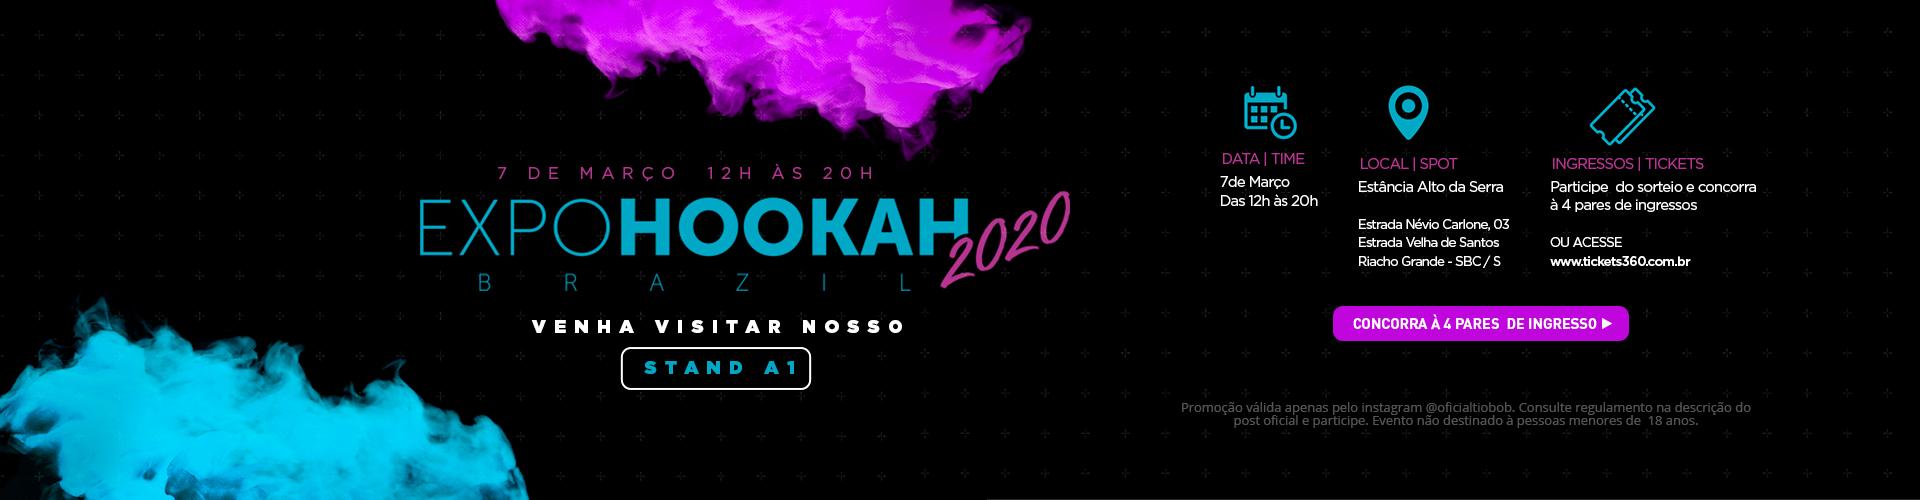 08_MASTER_DESK_EXPO_HOOKAH